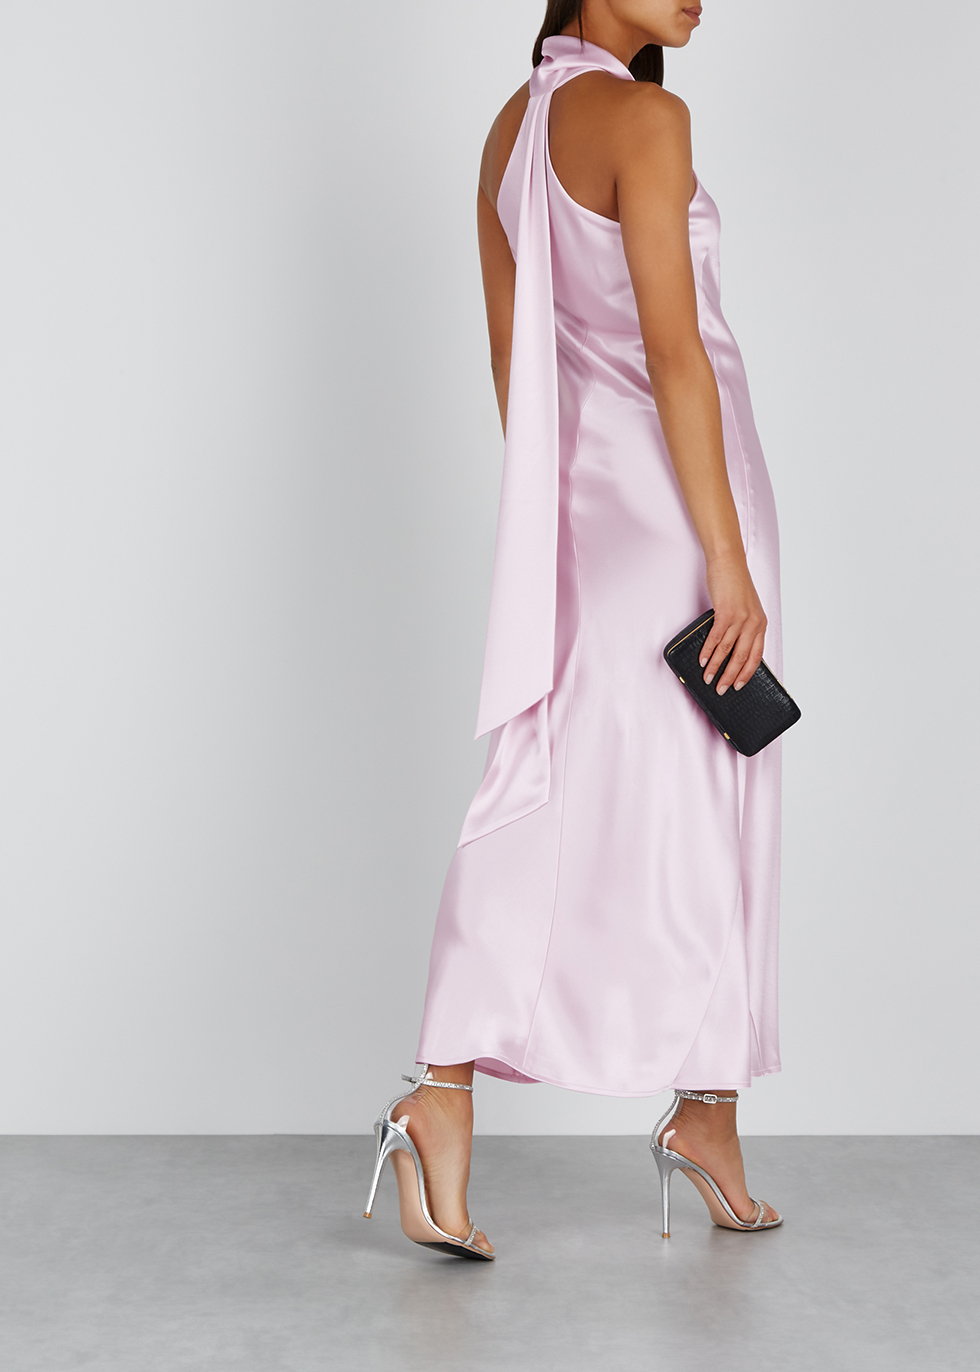 Pandora lilac satin midi dress - Galvan